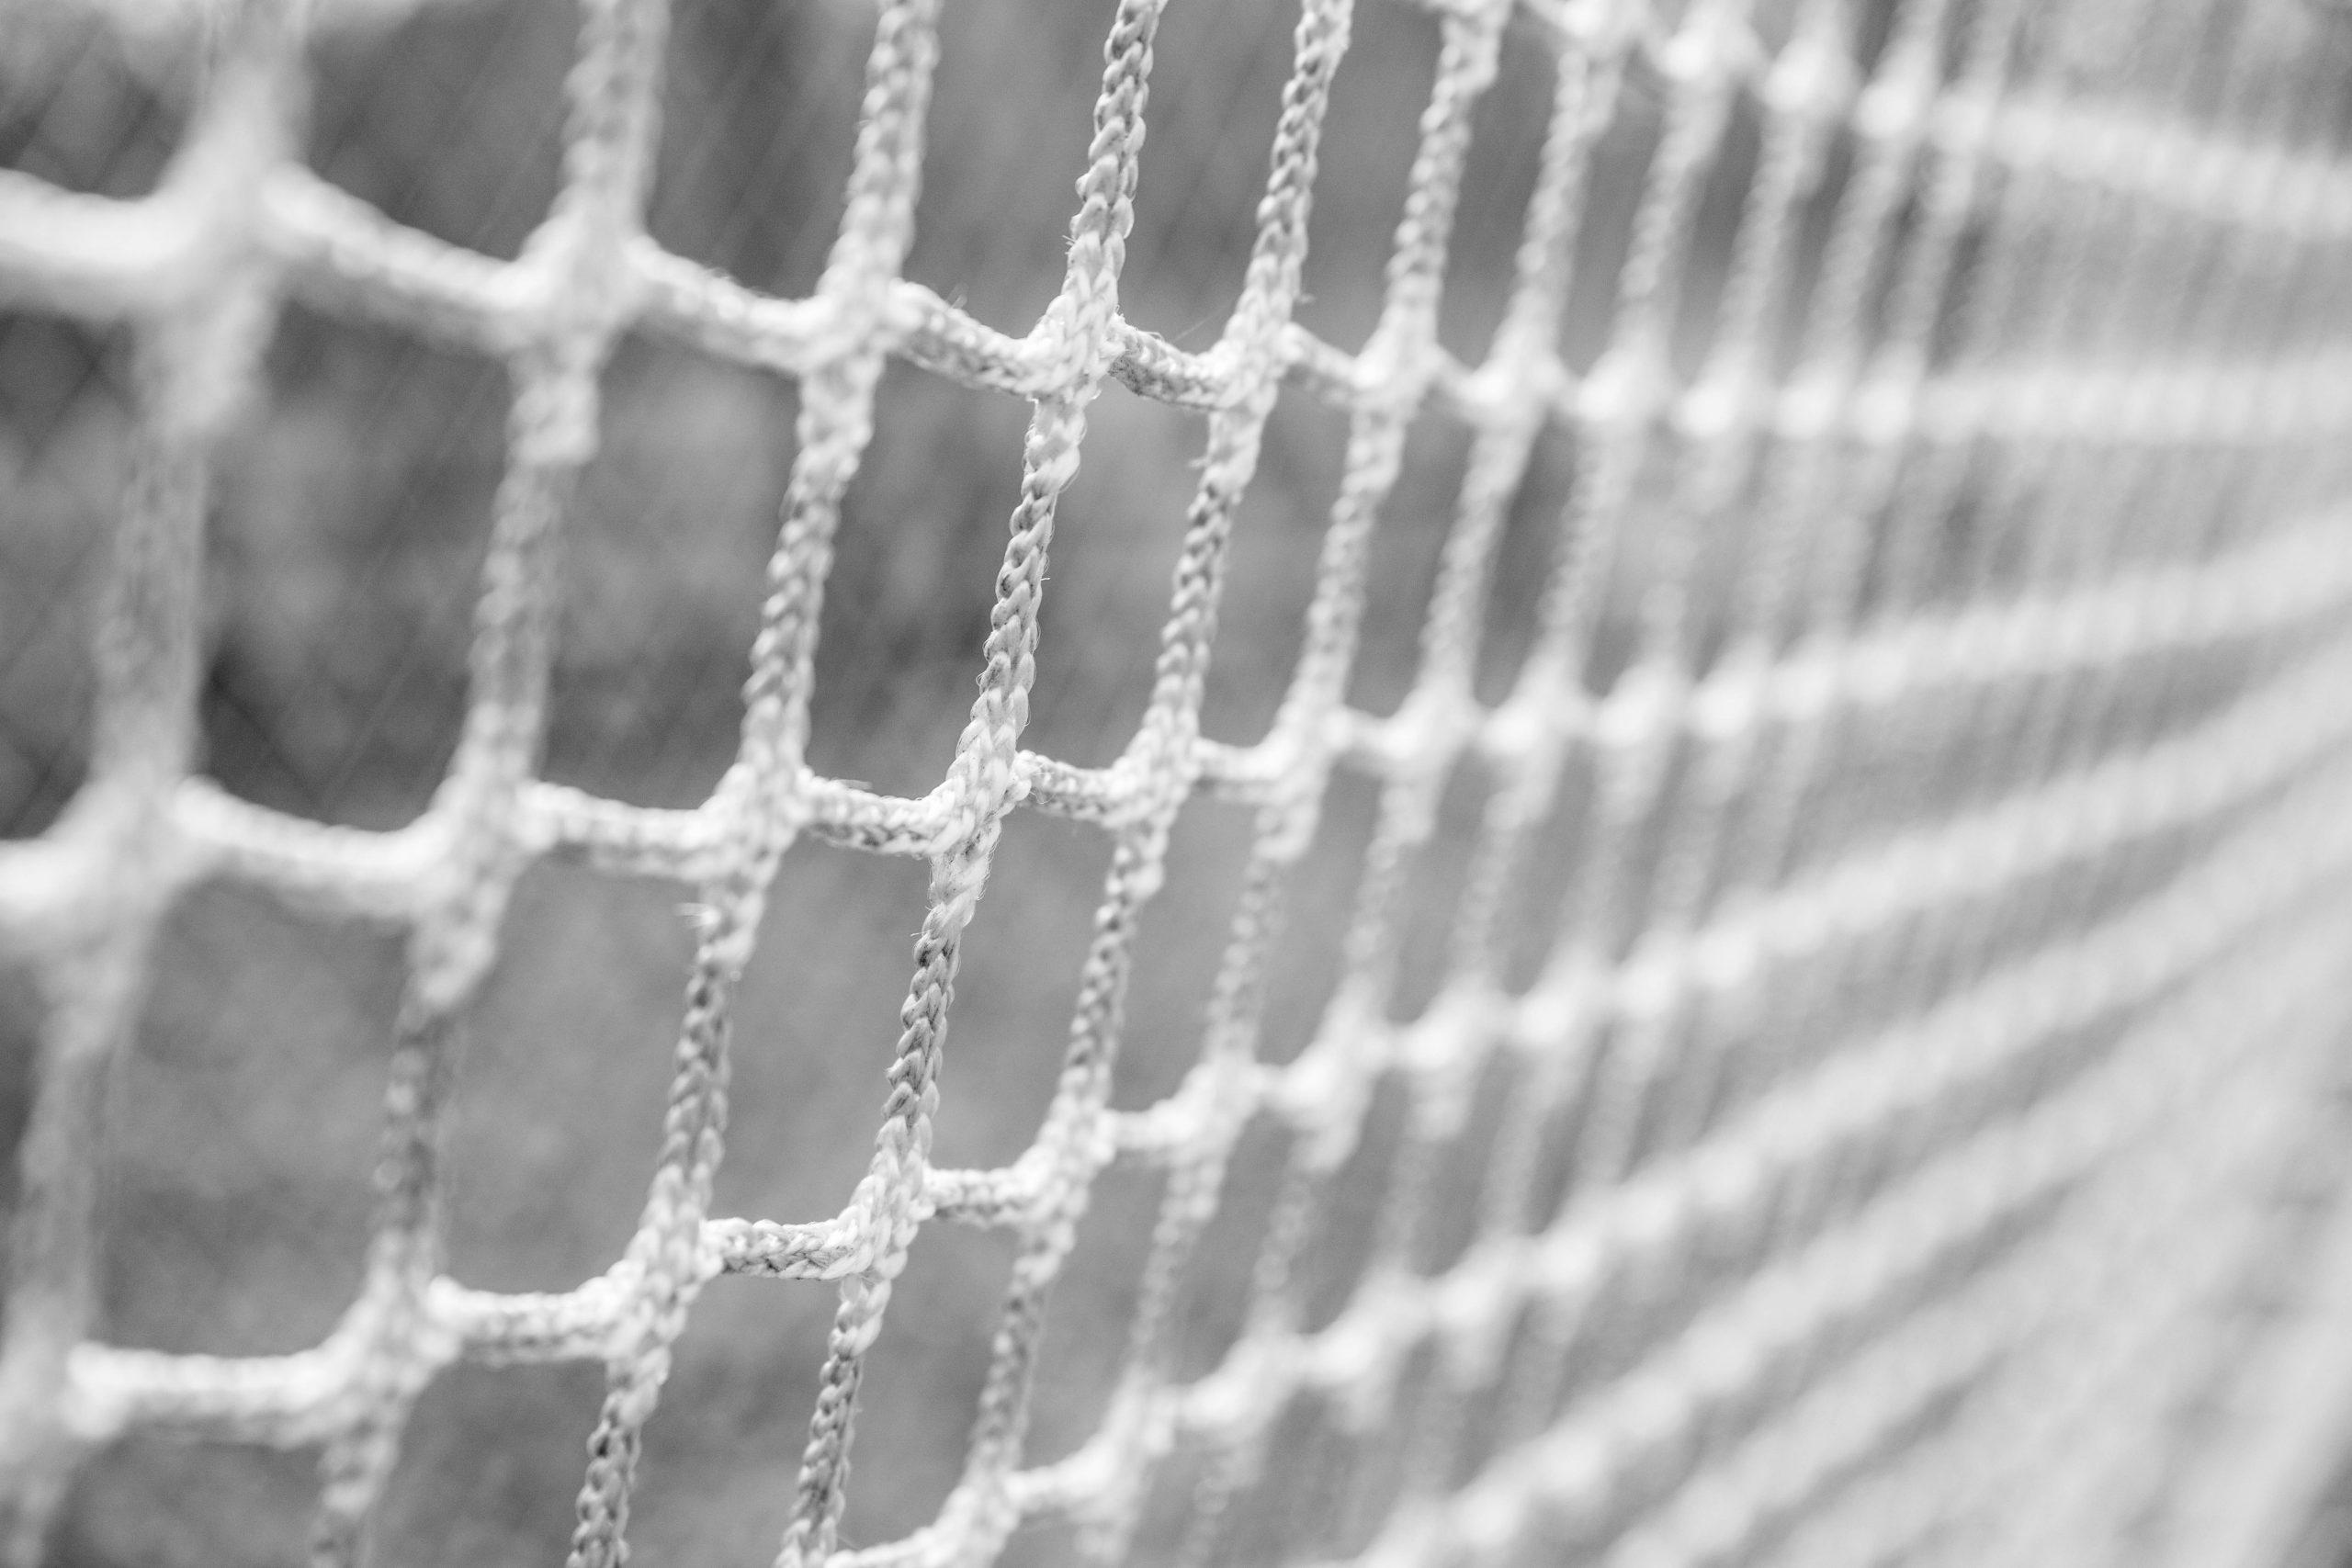 Miscellaneous netting